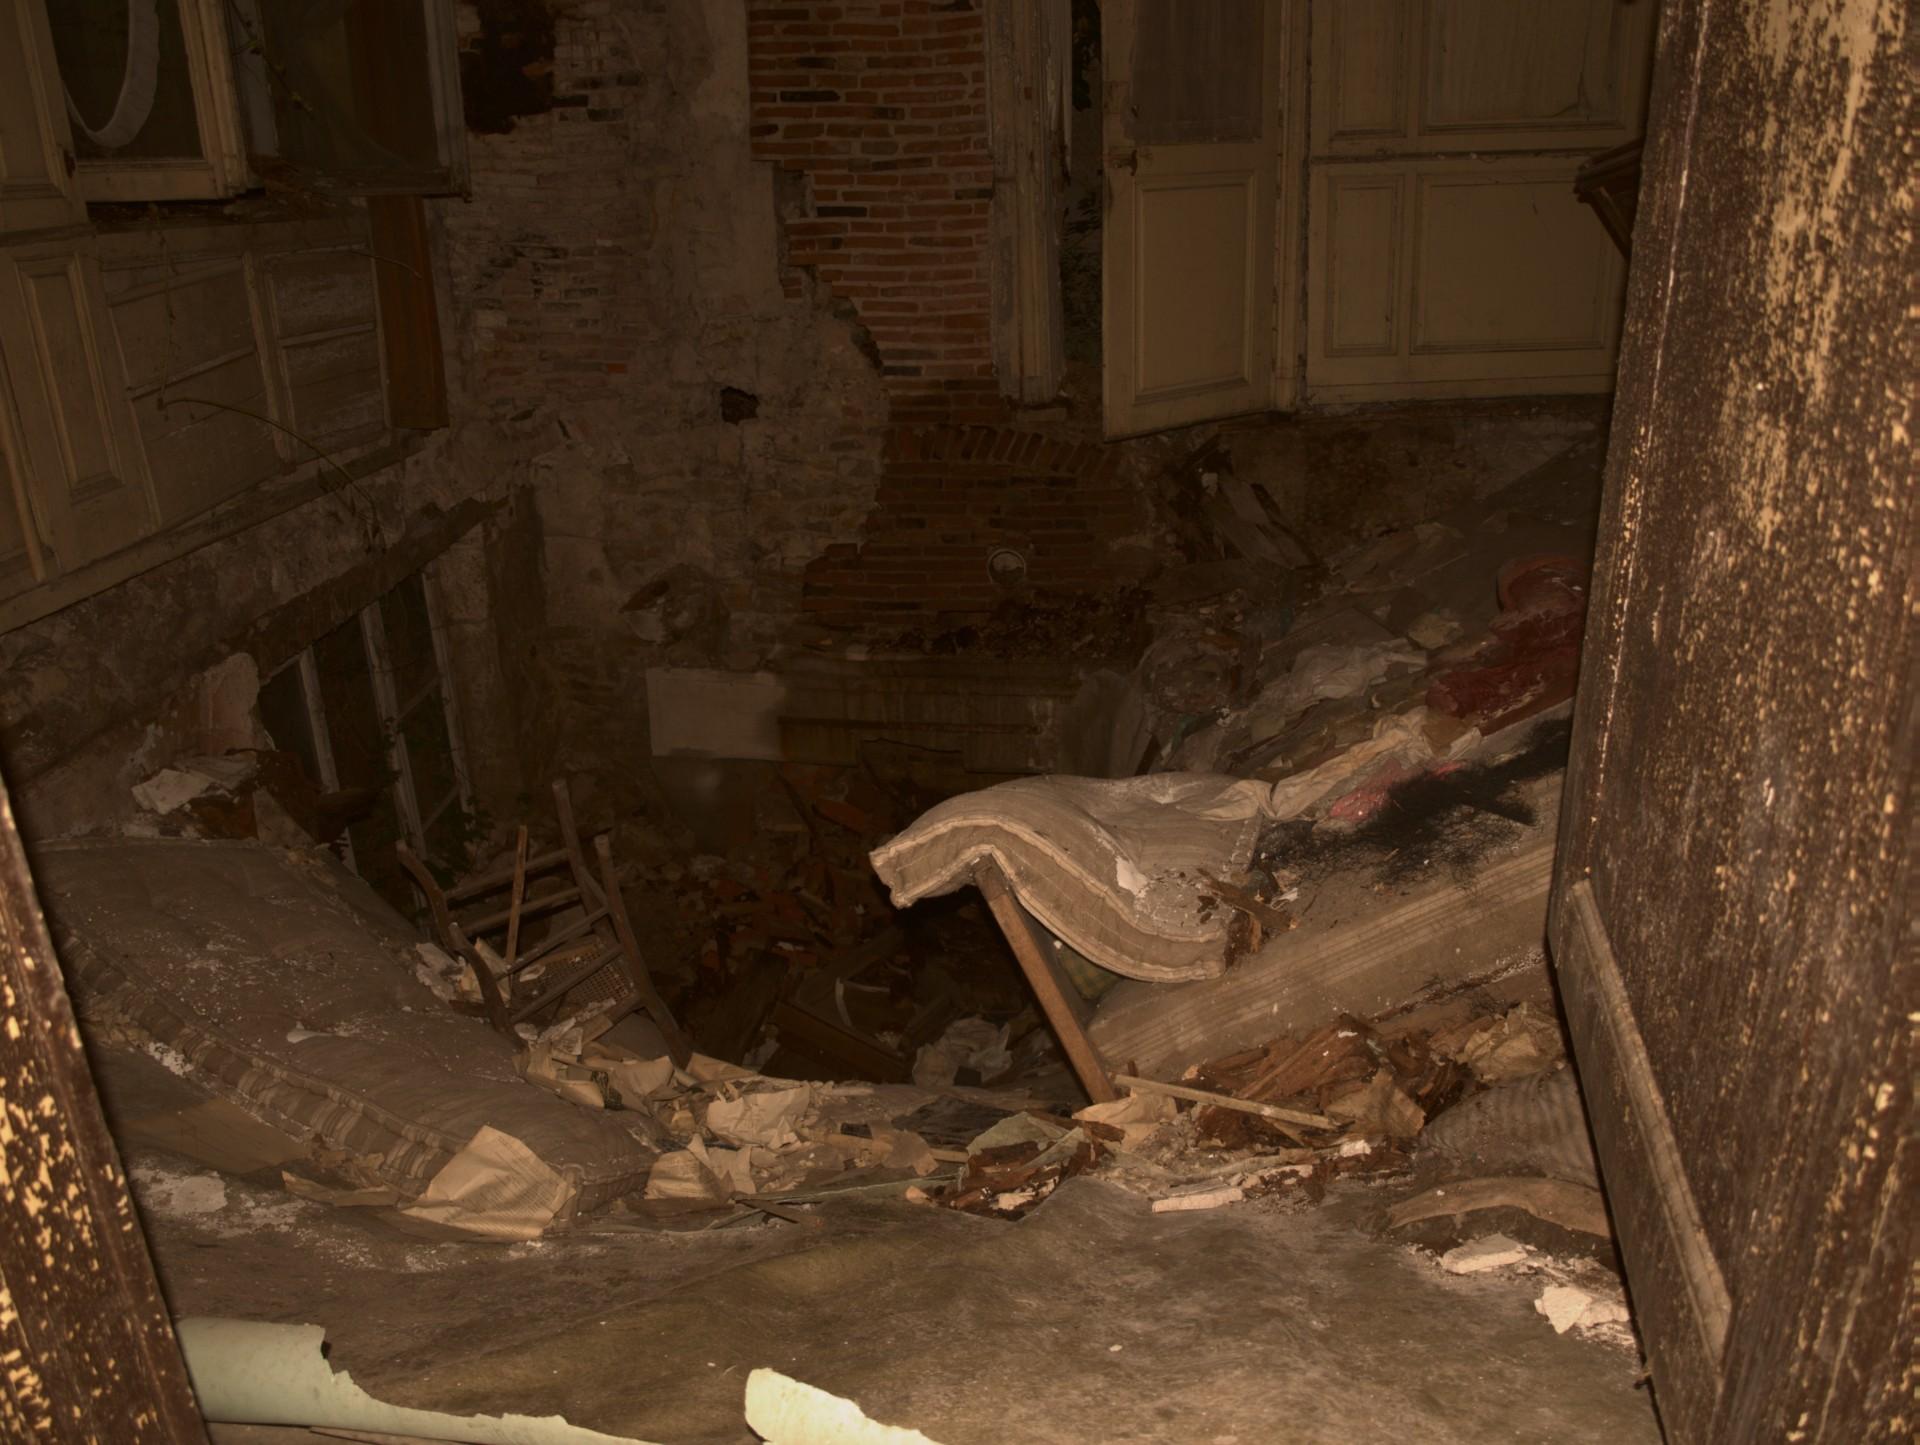 haunted House 0x02